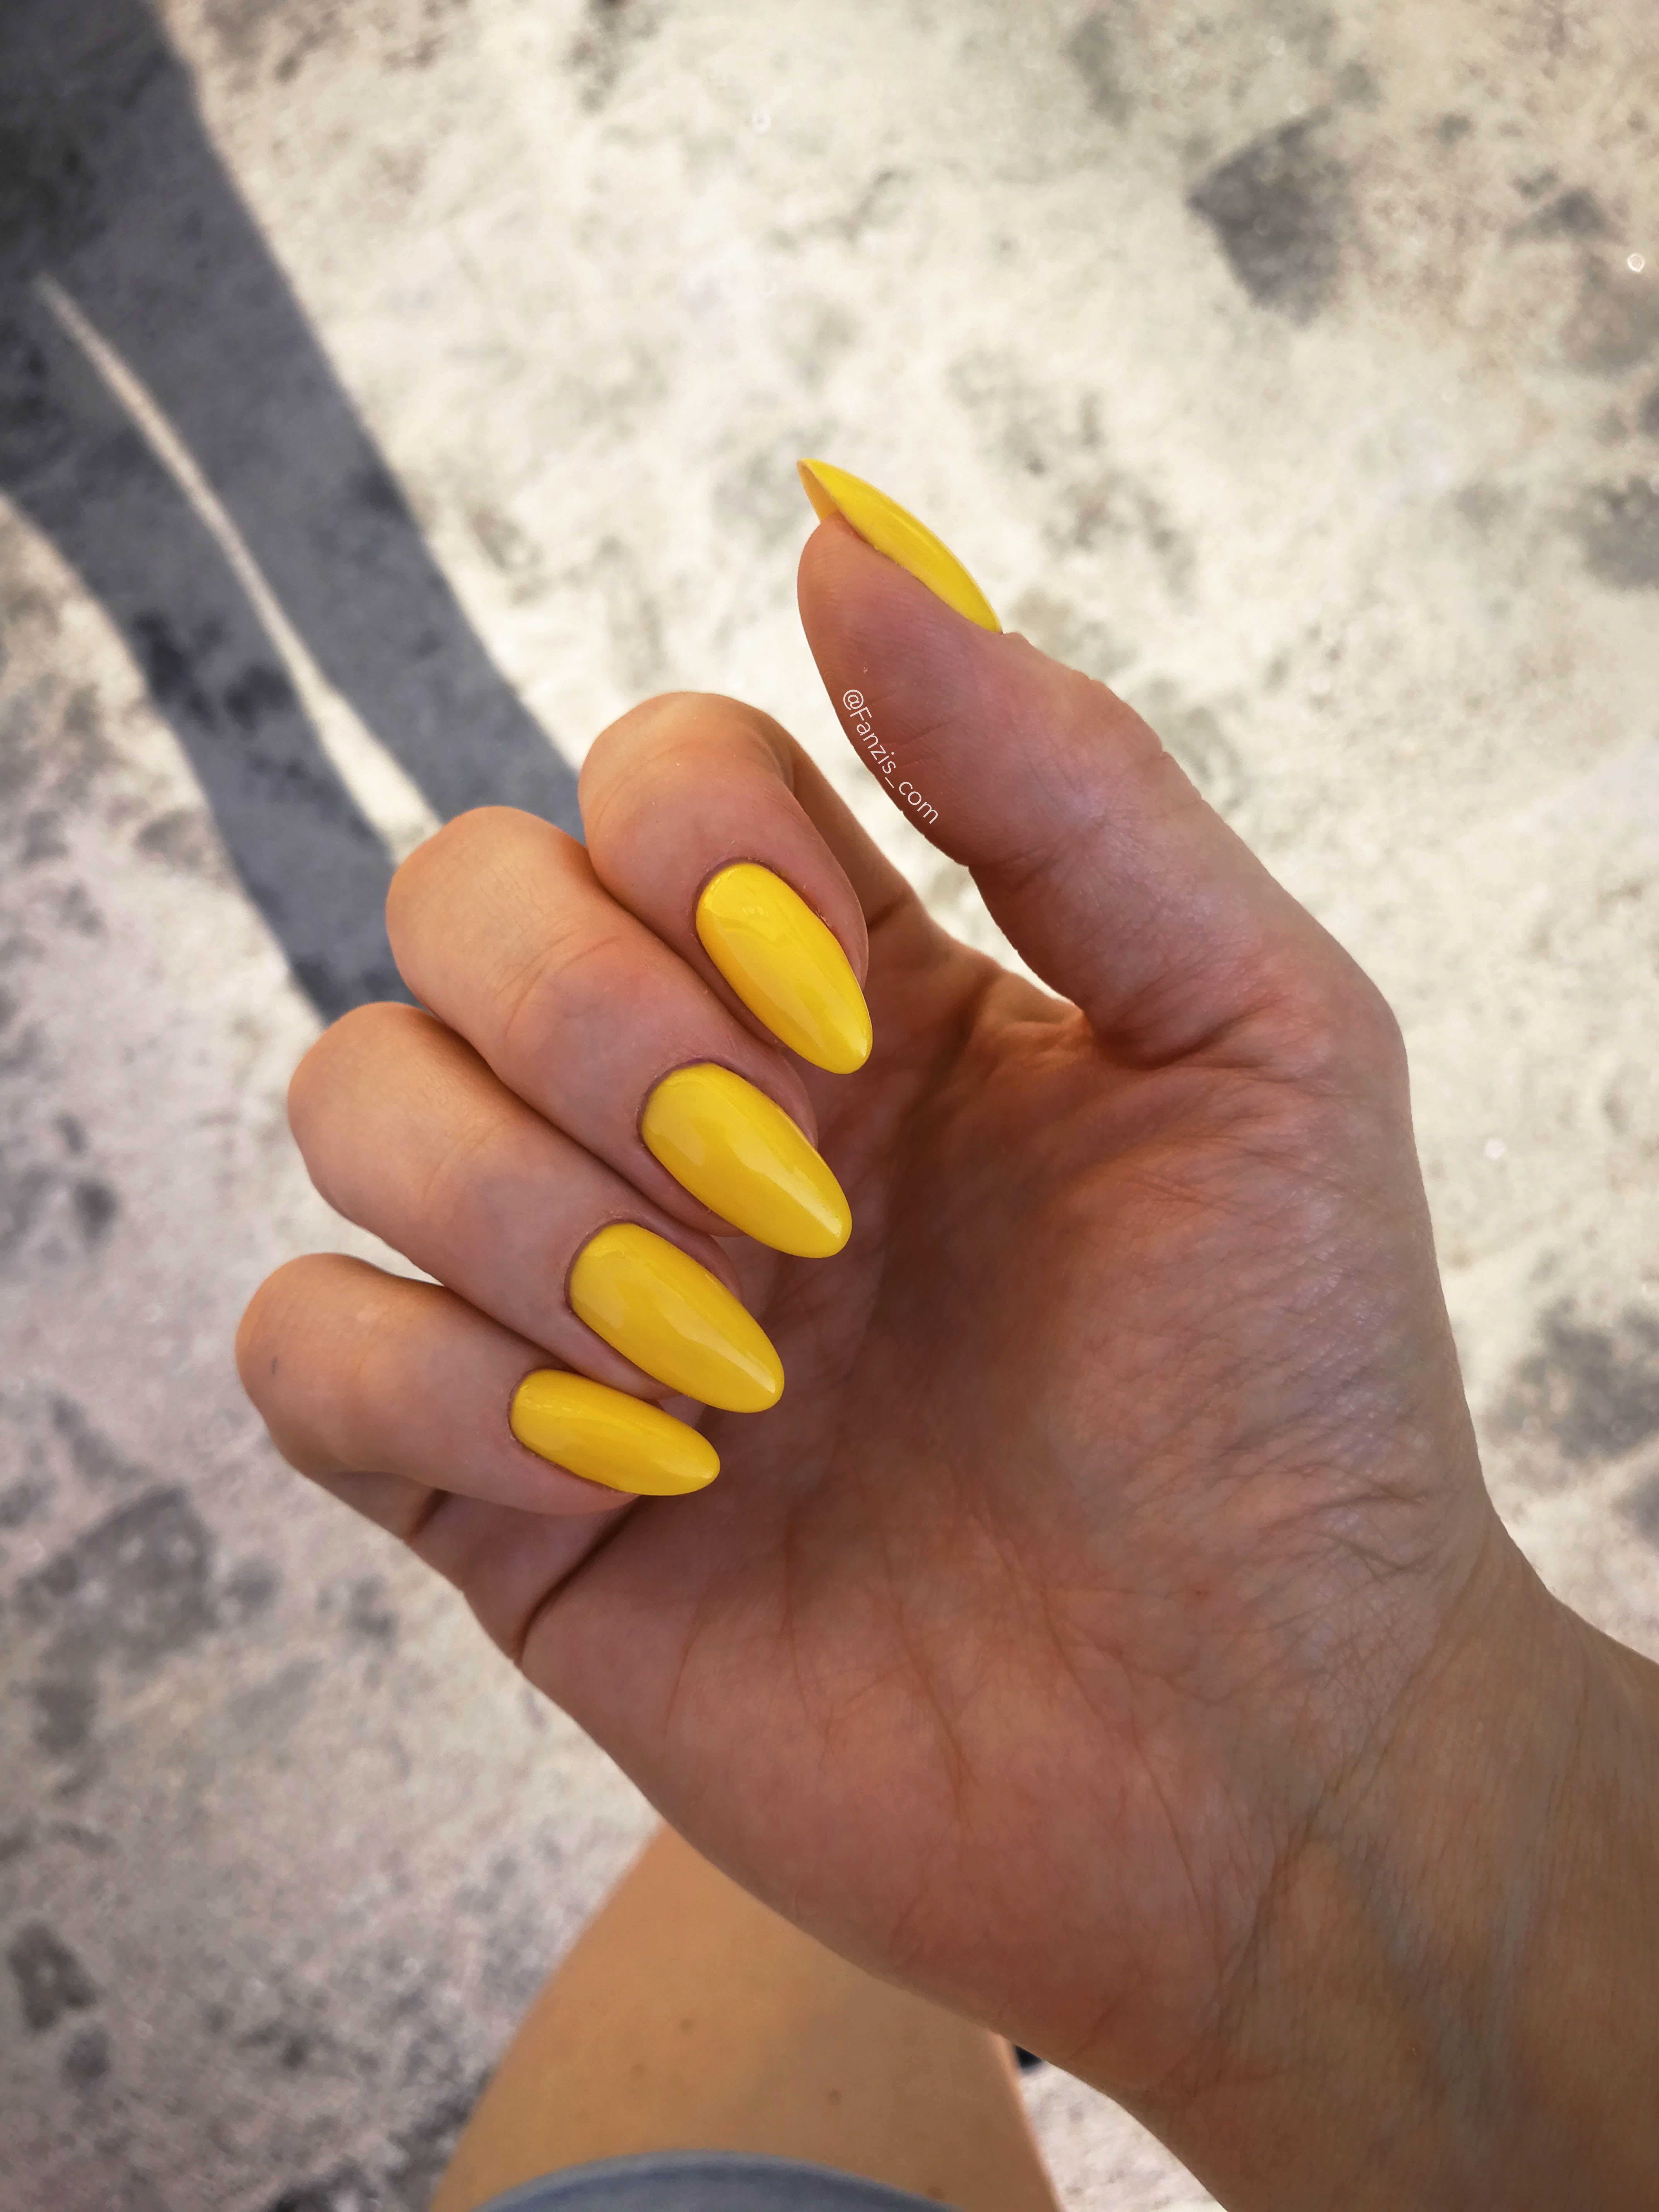 Bright Mustard Yellow Gelpolish Nails Halo From Madam Glam Acrylic Nails Yellow Almond Nails Designs Yellow Nails Design